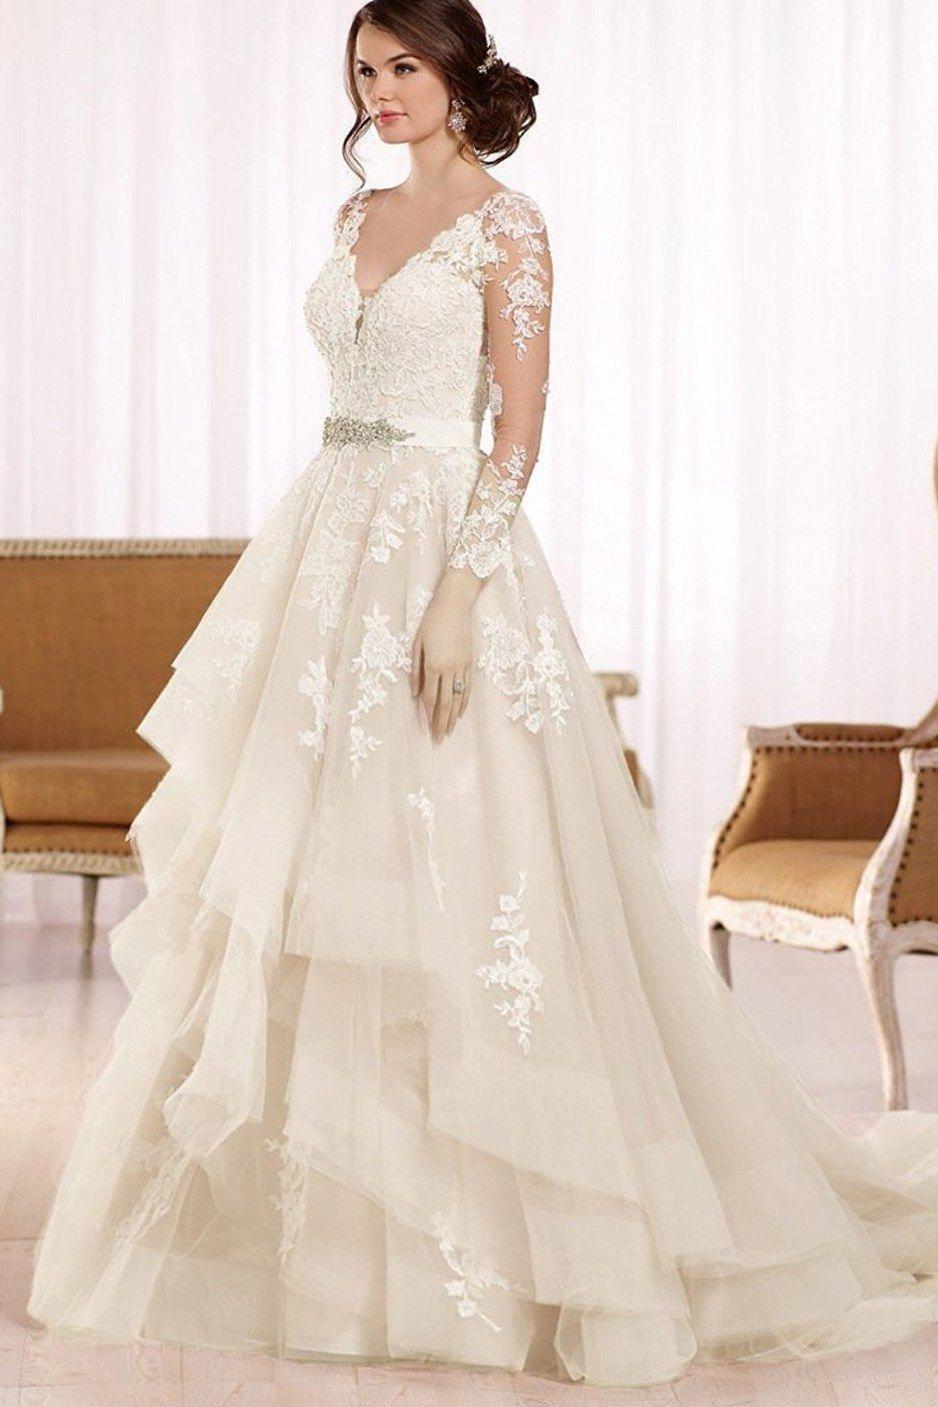 20 Gorgeous Wedding Dresses You Won T Believe You Can Get On Amazon Wedding Dresses Amazon Gorgeous Wedding Dress Ball Gowns Wedding [ 1407 x 938 Pixel ]